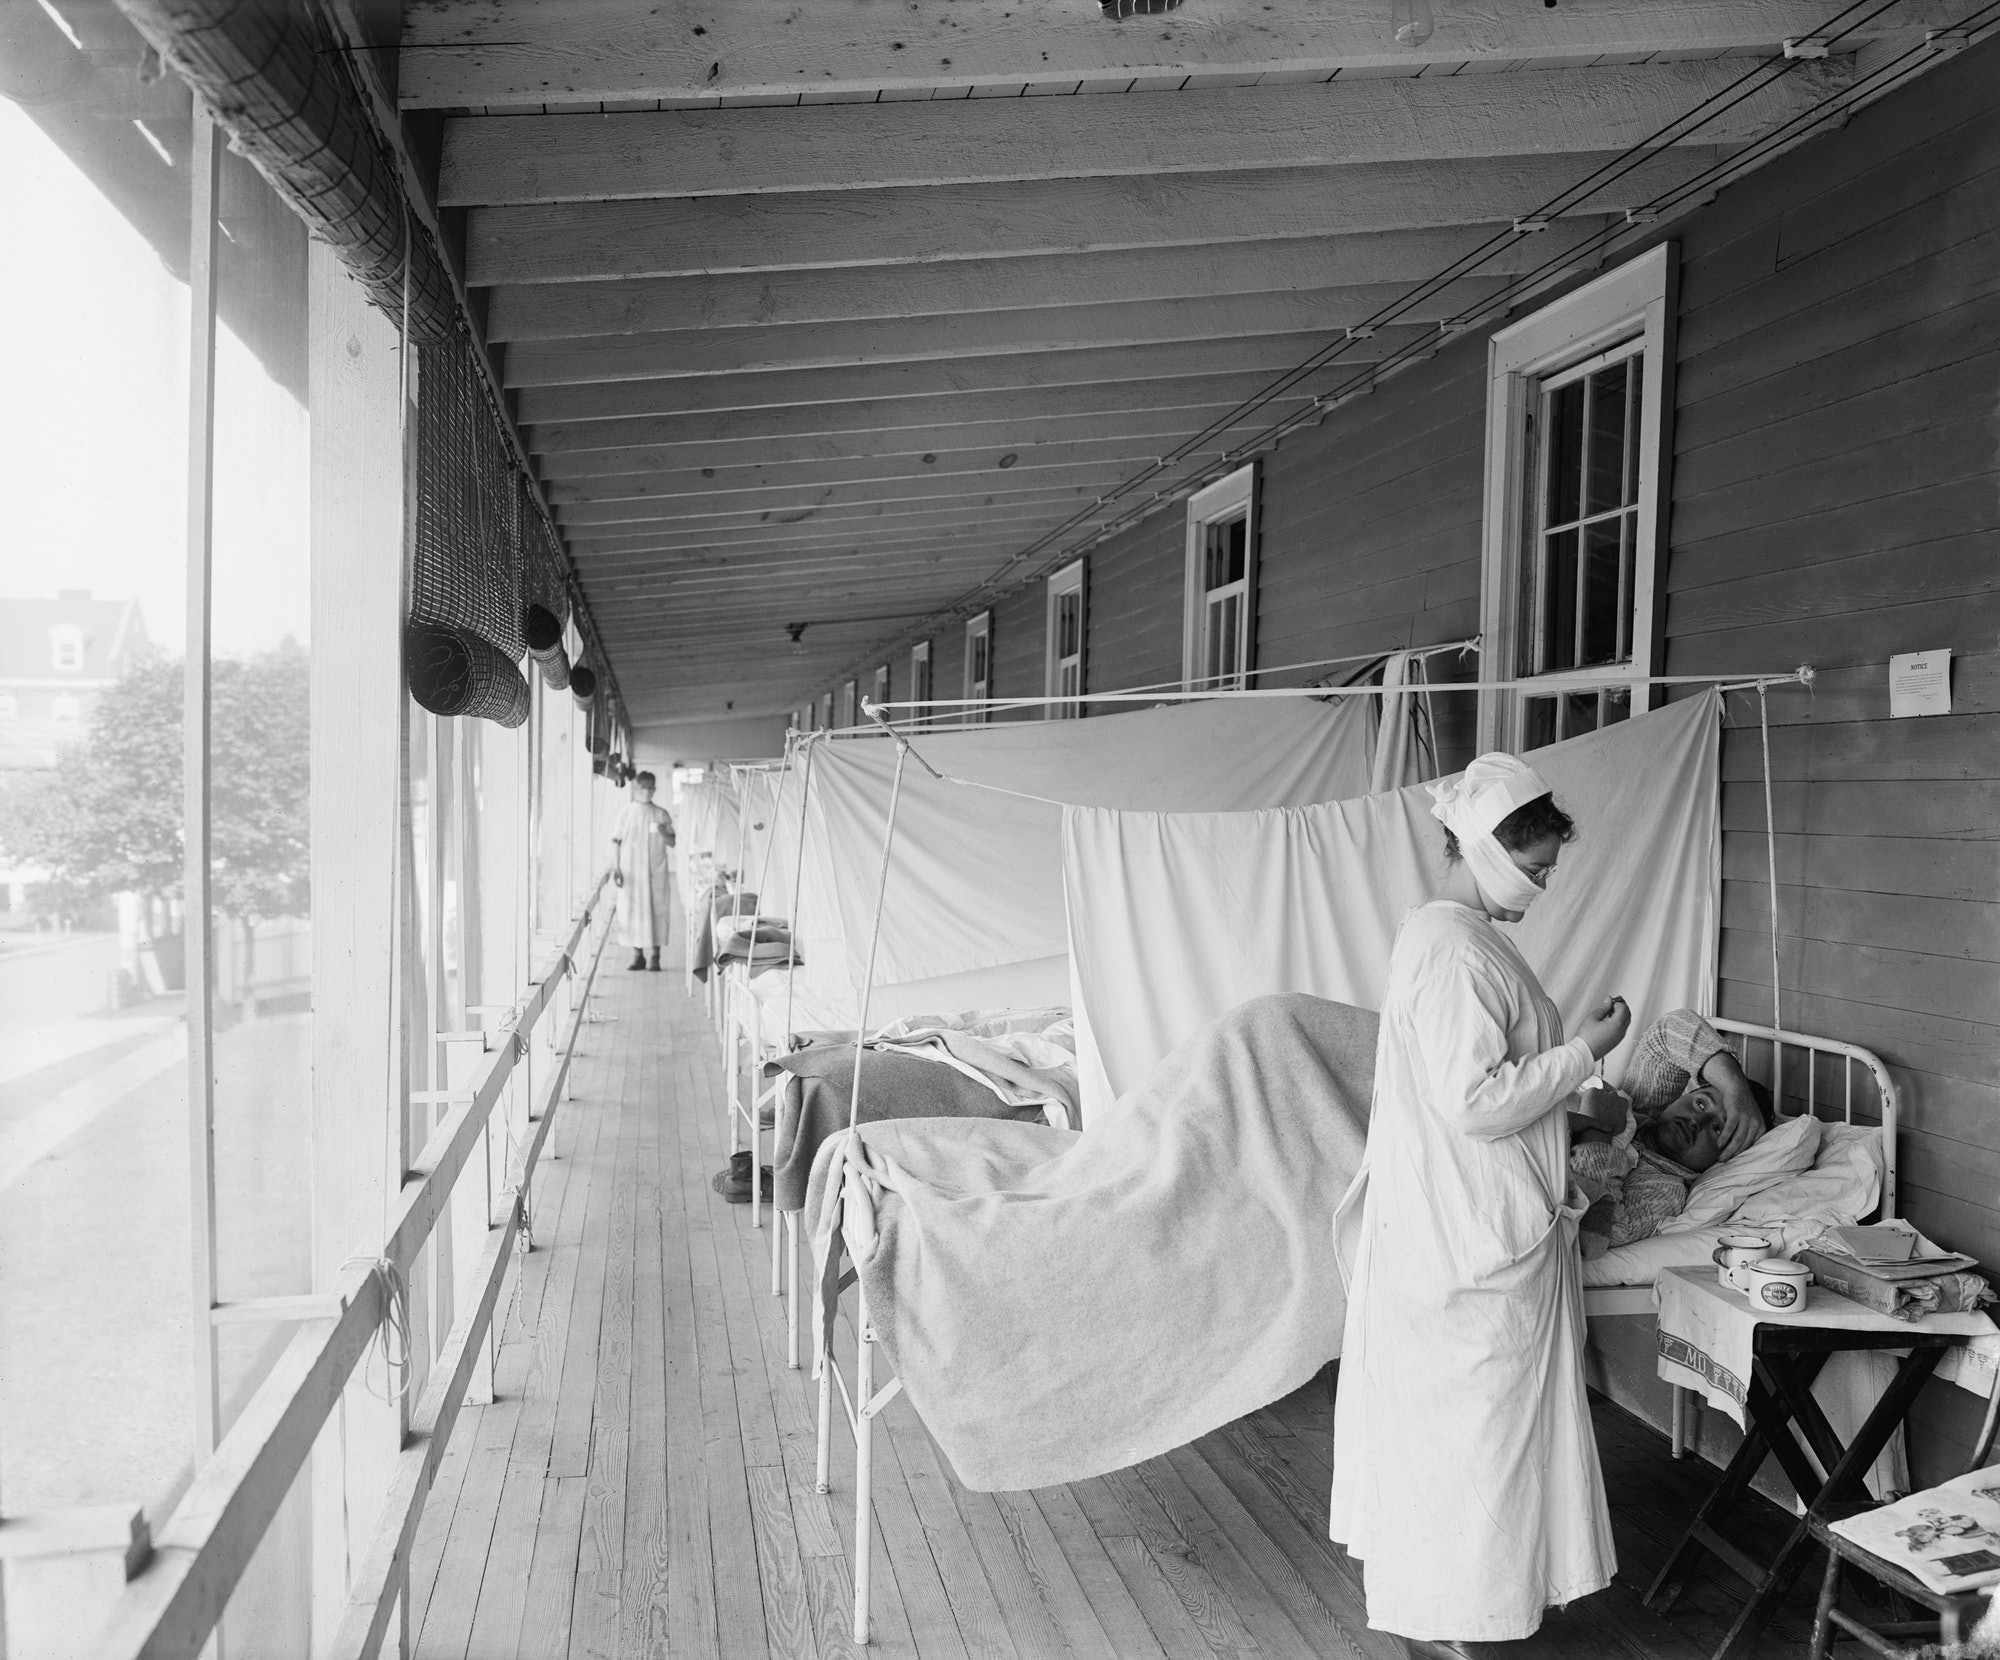 flu patients